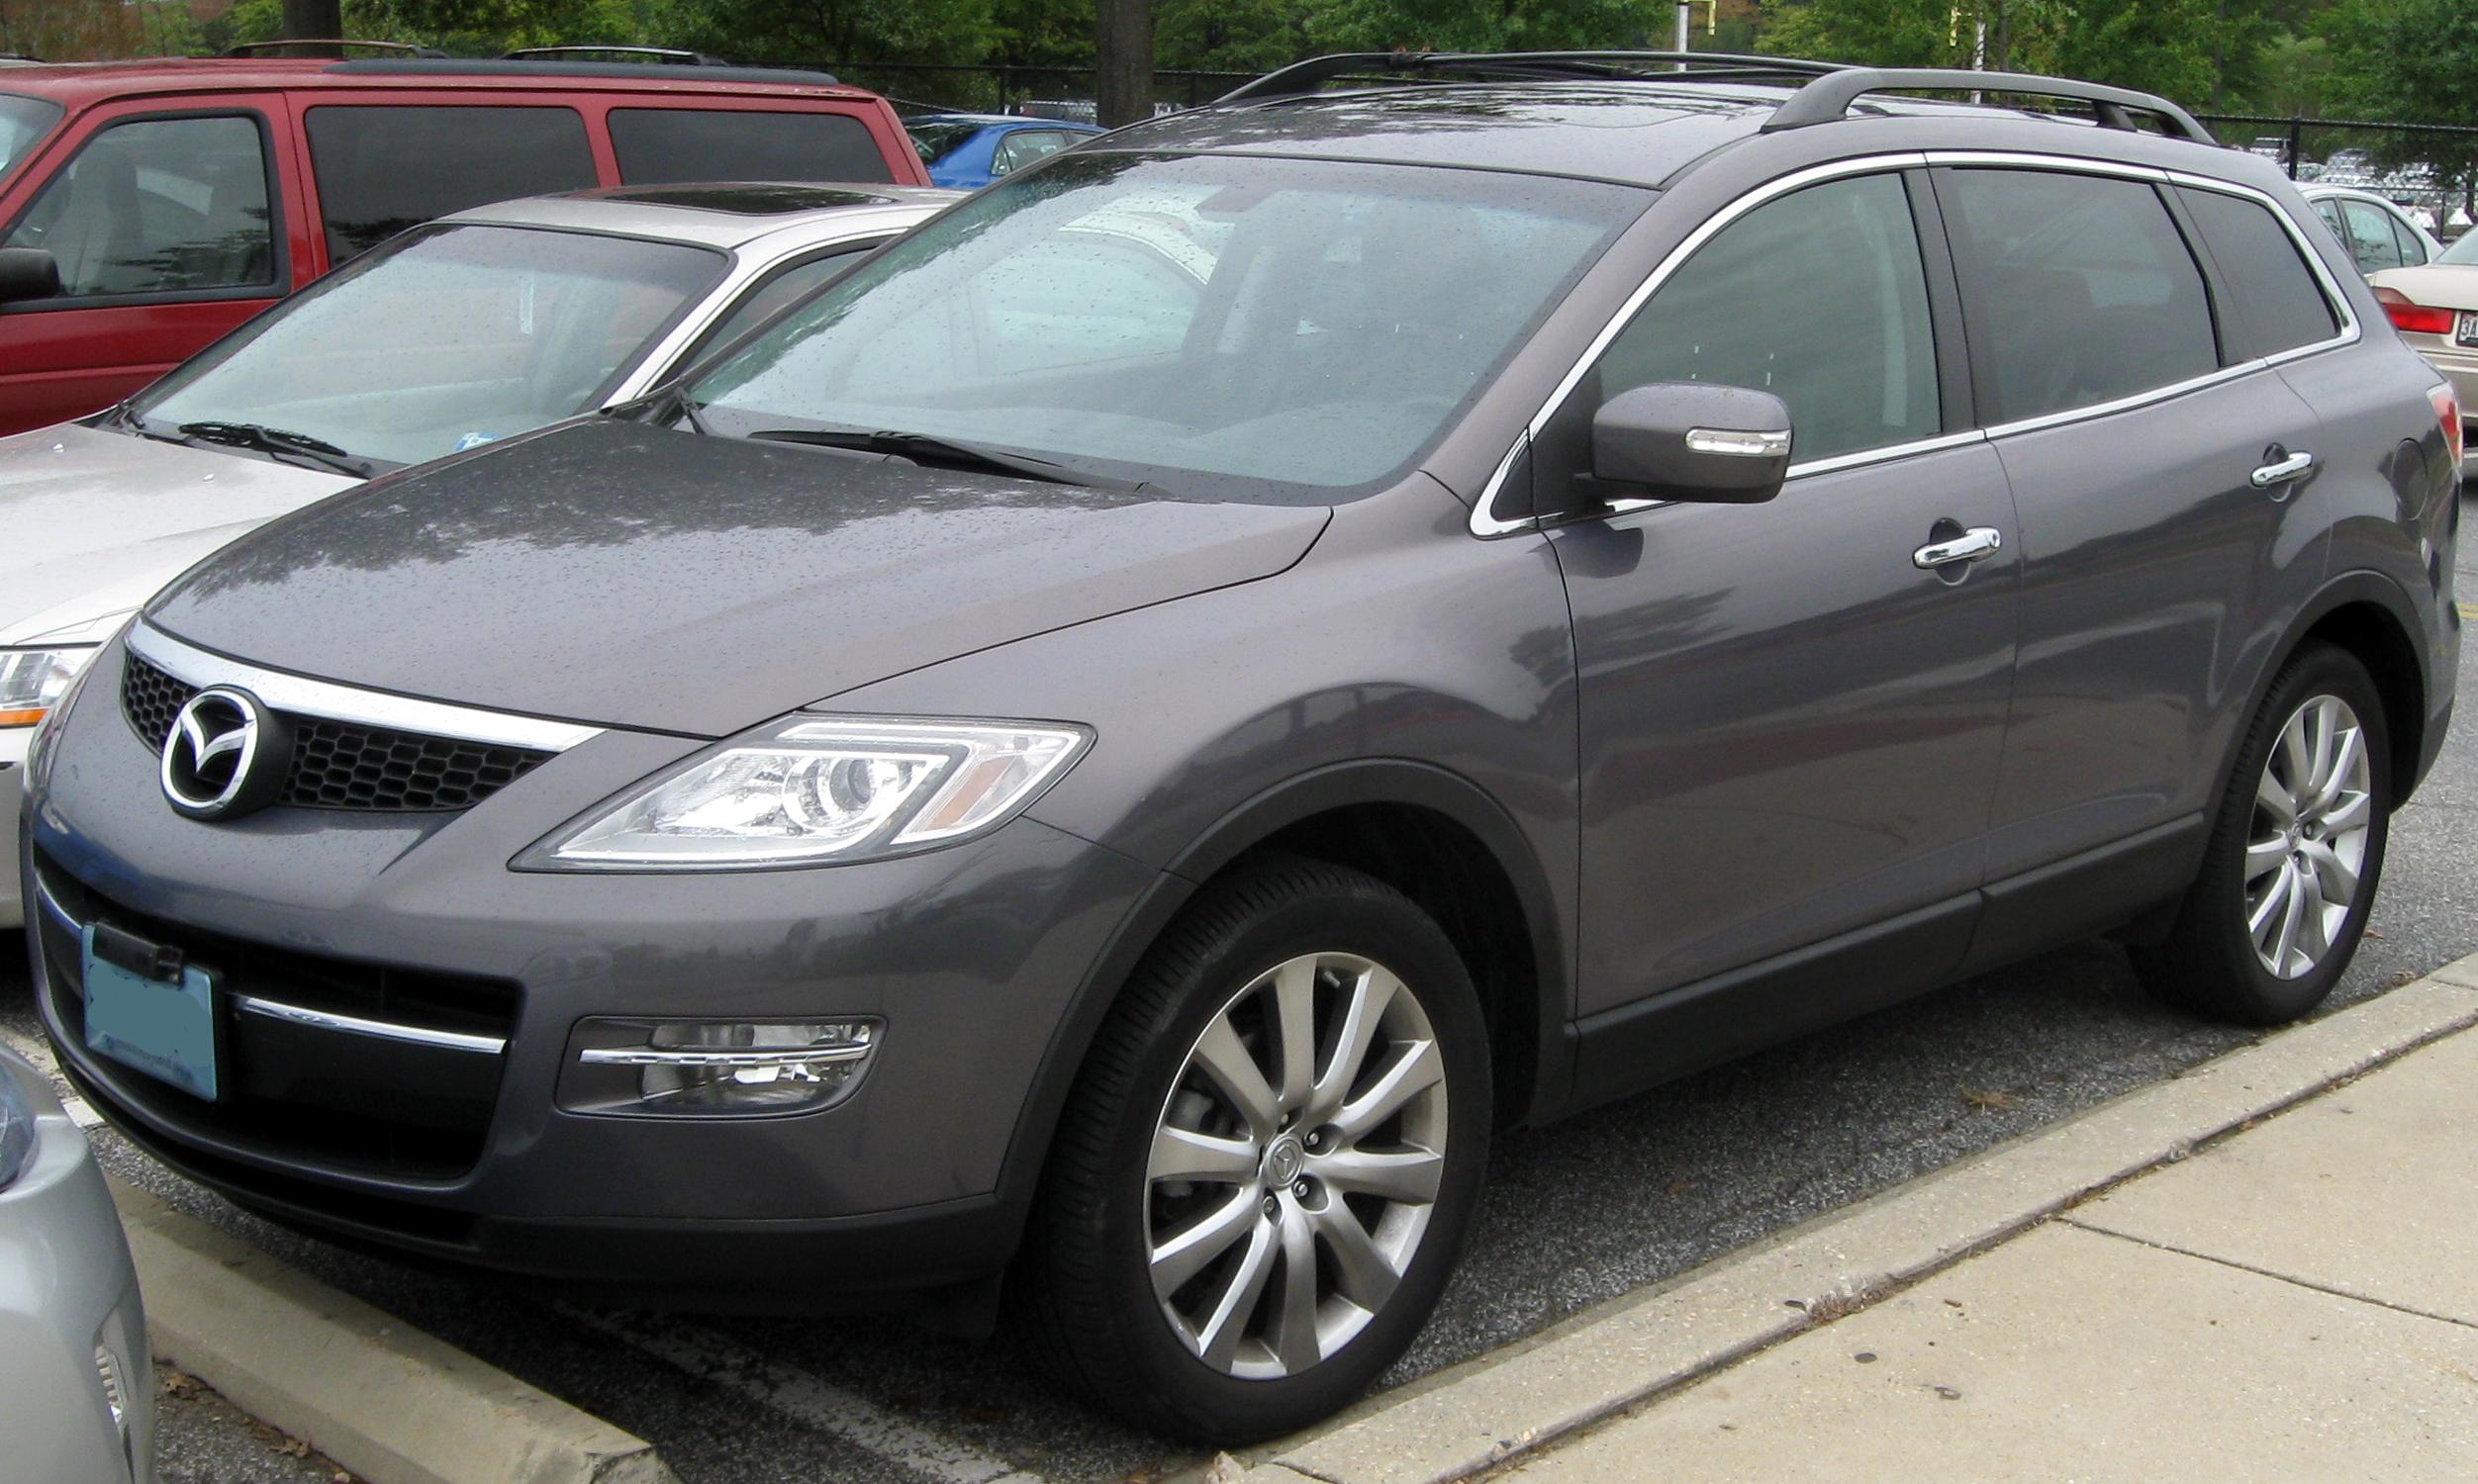 File:2007-2009 Mazda CX-9 -- 09-29-2010.jpg - Wikipedia, the free ...